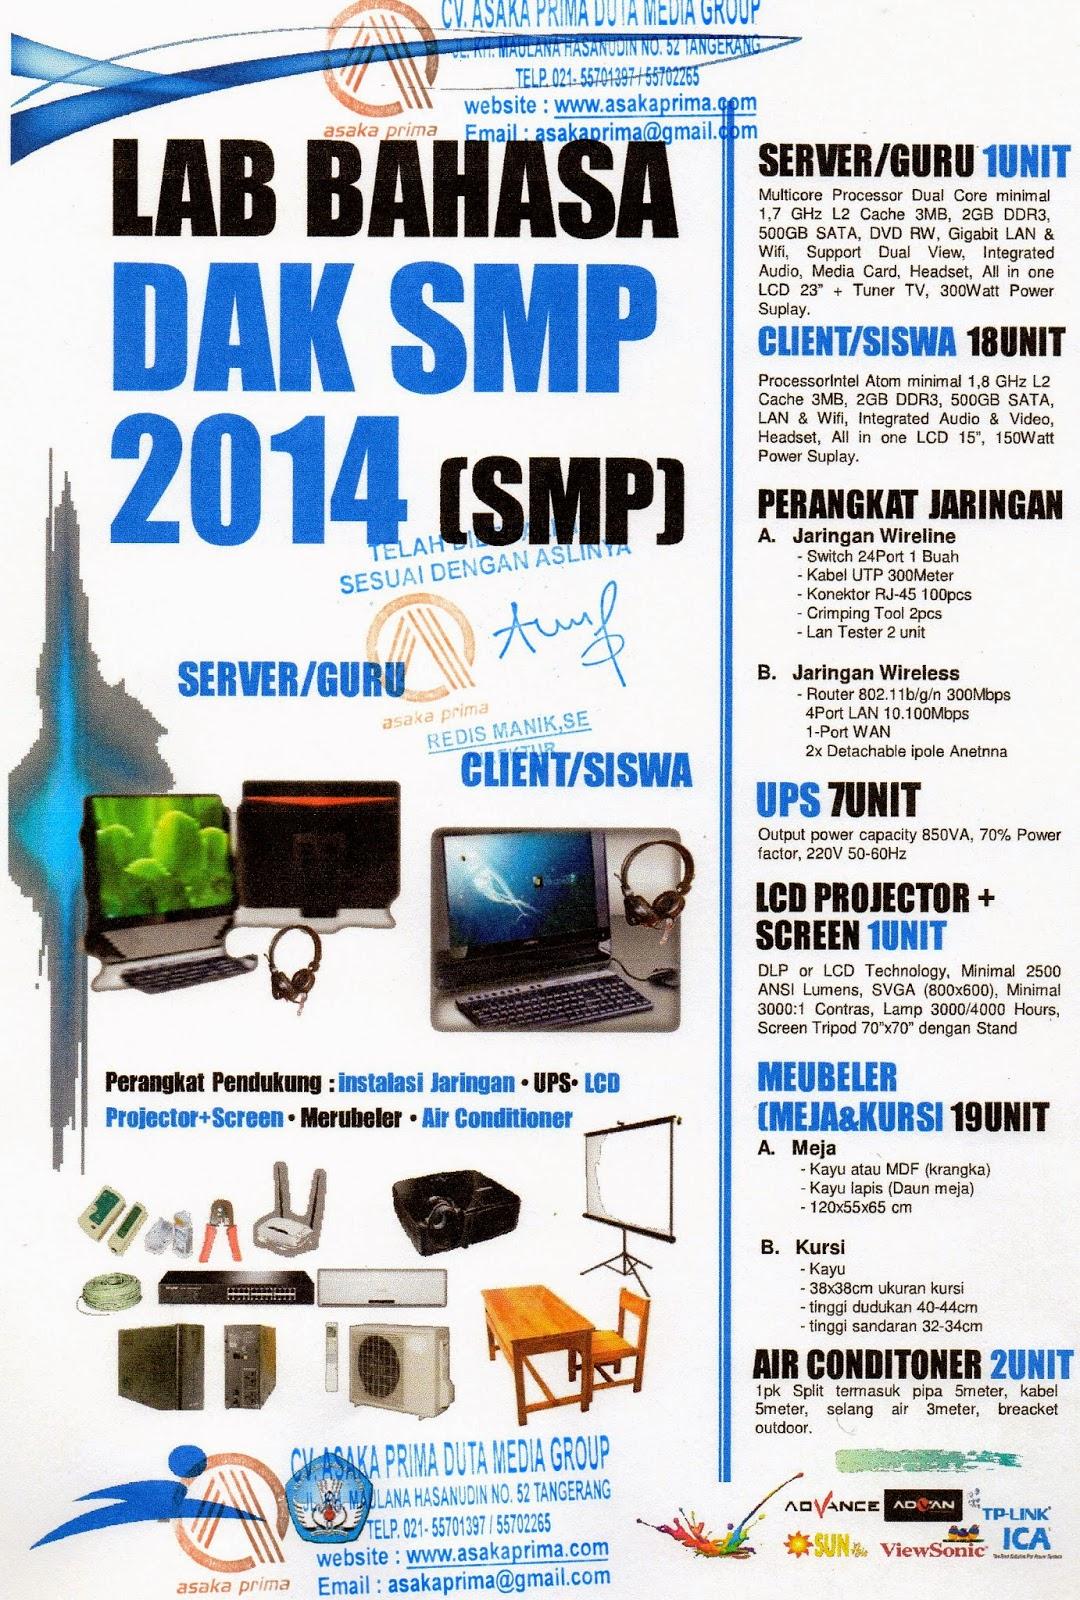 Spesifikasi Laboratorium Bahasa SMP 2014 ,LAB BAHASA SMP 2015,SPESIFIKASI LABORATORIUM BAHASA SMP,DAK SMP 2015,PRODUK LAB BAHASA SMP,DAK SMP 2015Produk DAK SMP 2015